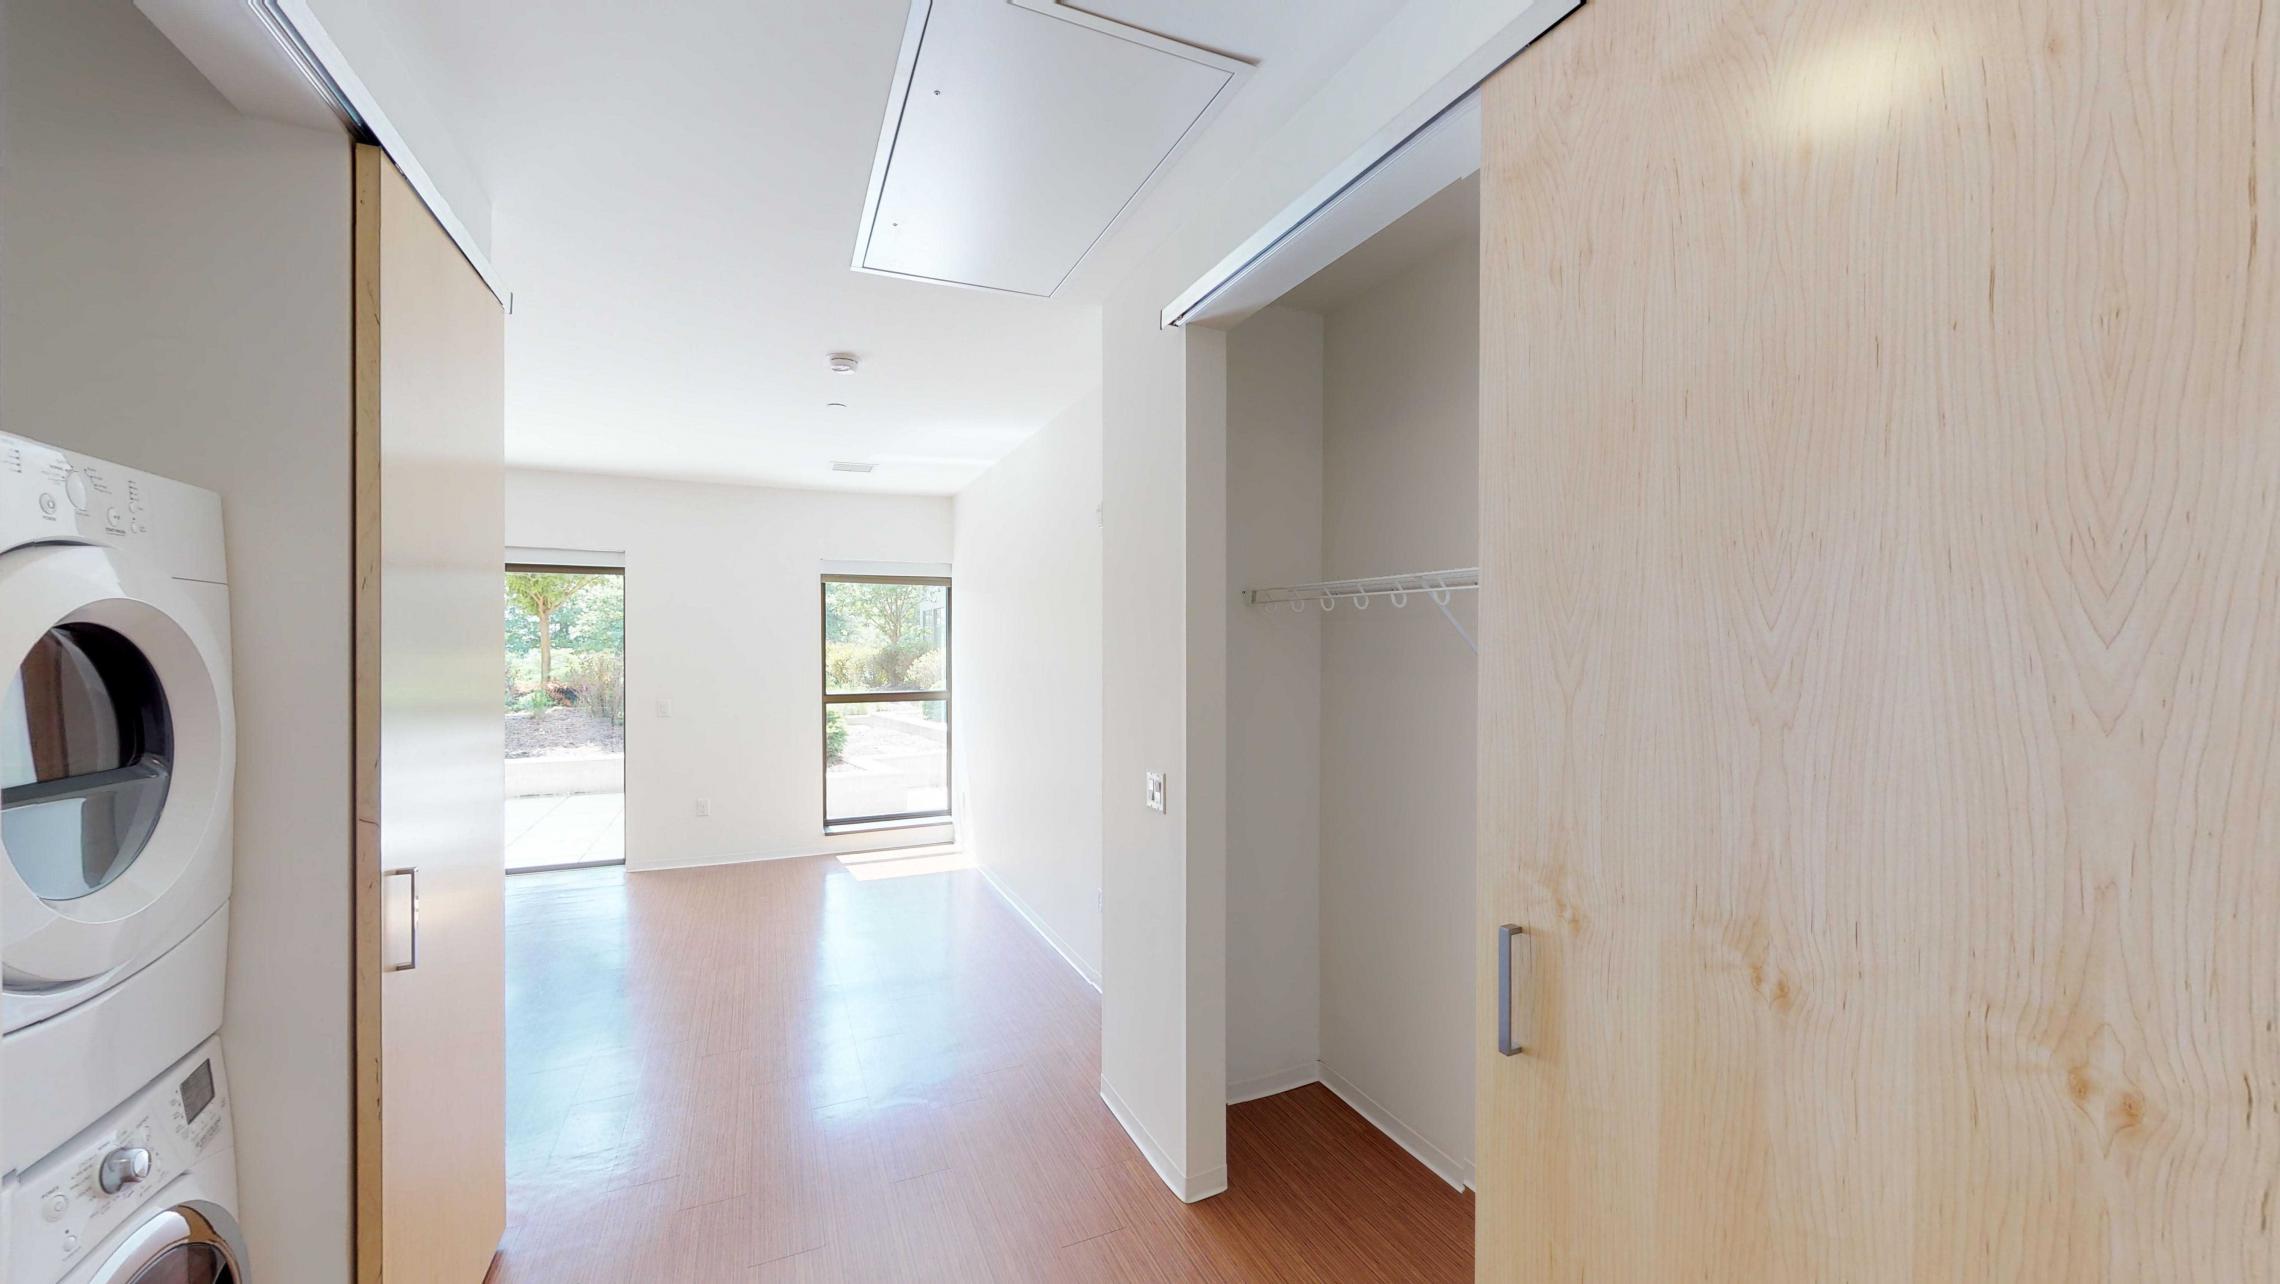 SEVEN27-Apartment-115-studio-lake view-modern-upscale-downtown-madison-patio-courtyard-closet-storage.jpg